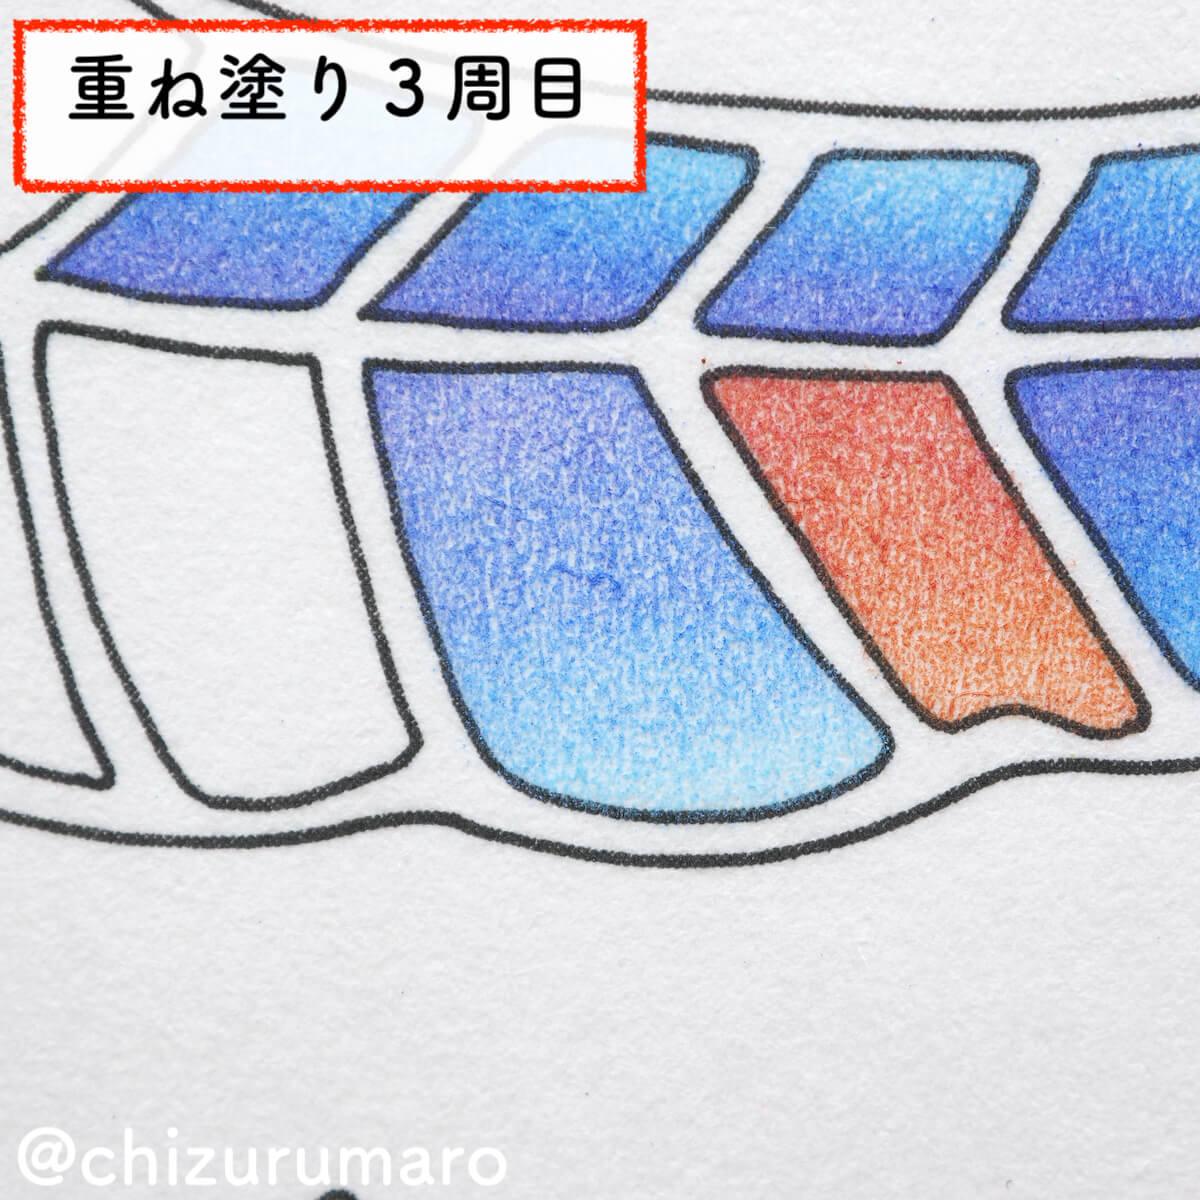 f:id:chizurumaro:20200609143627j:plain